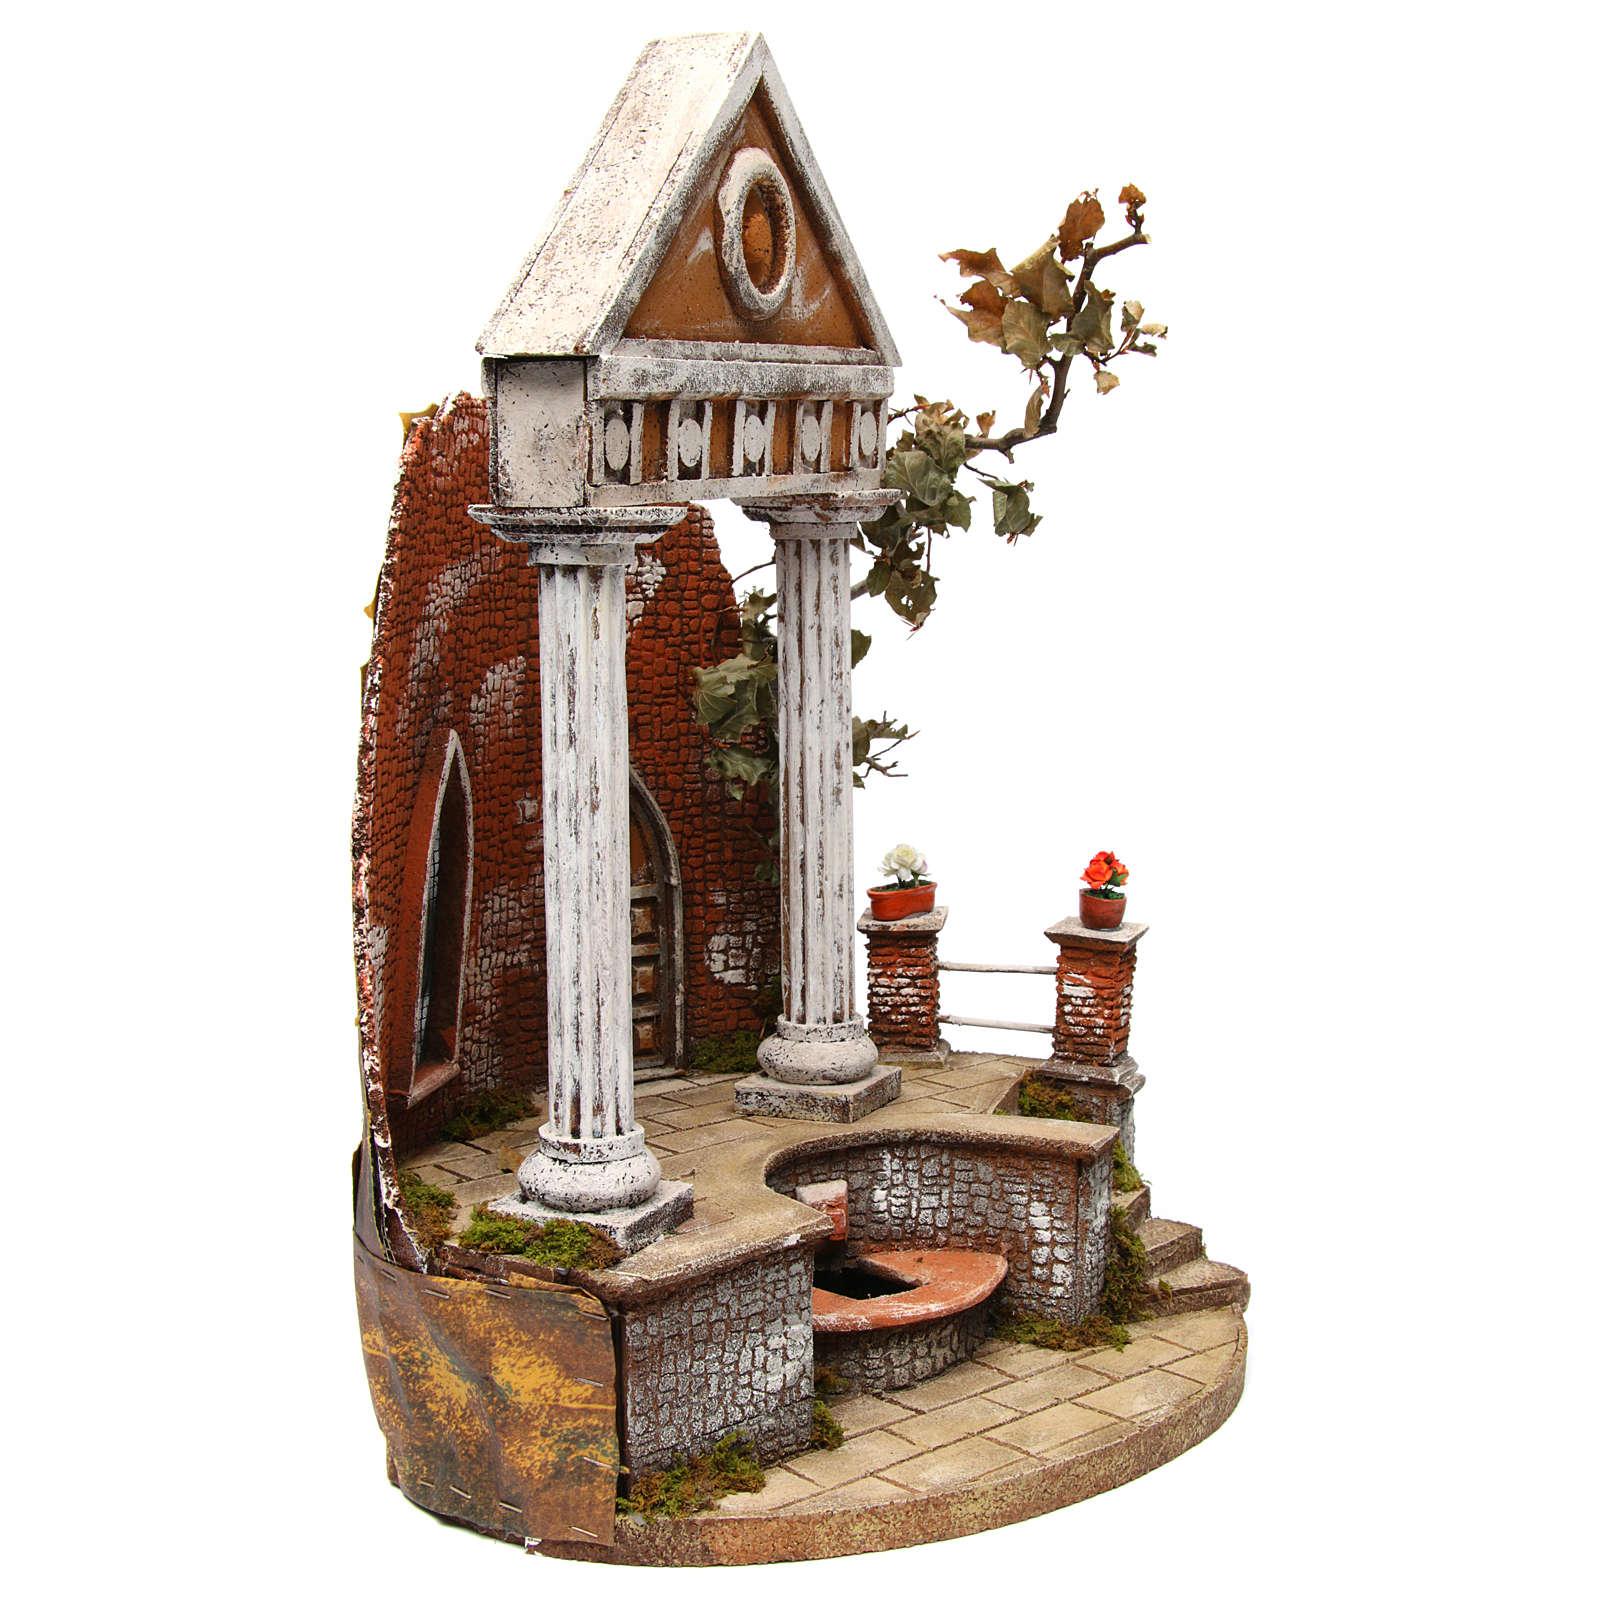 Tempio 55x35x20 cm presepe napoletano 4